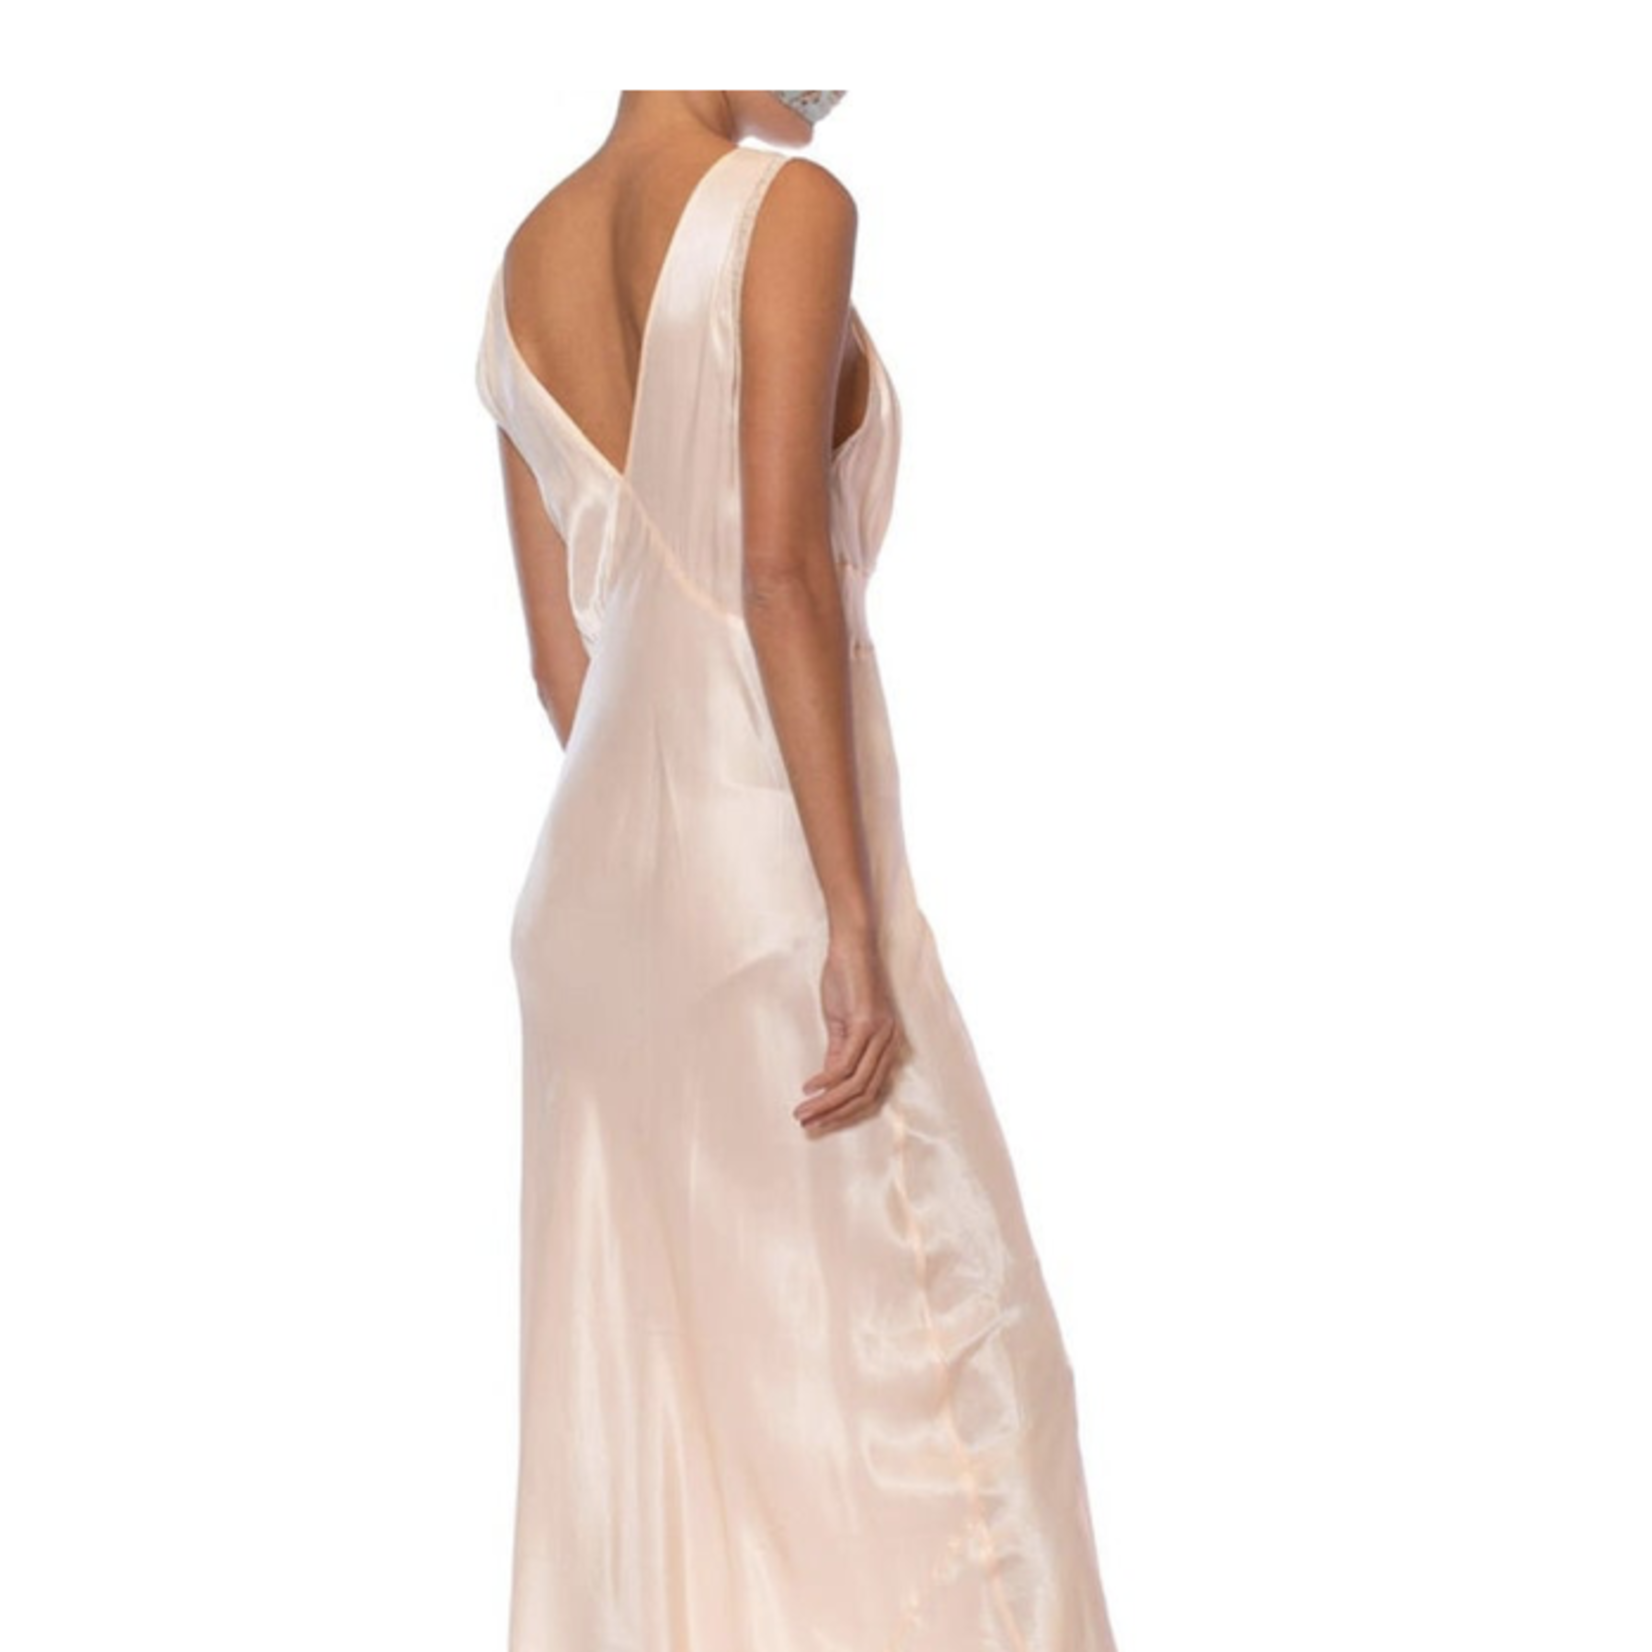 1940s White & Pink Rayon Bias Cut Floral Slip Dress Negligee SL9ON43288